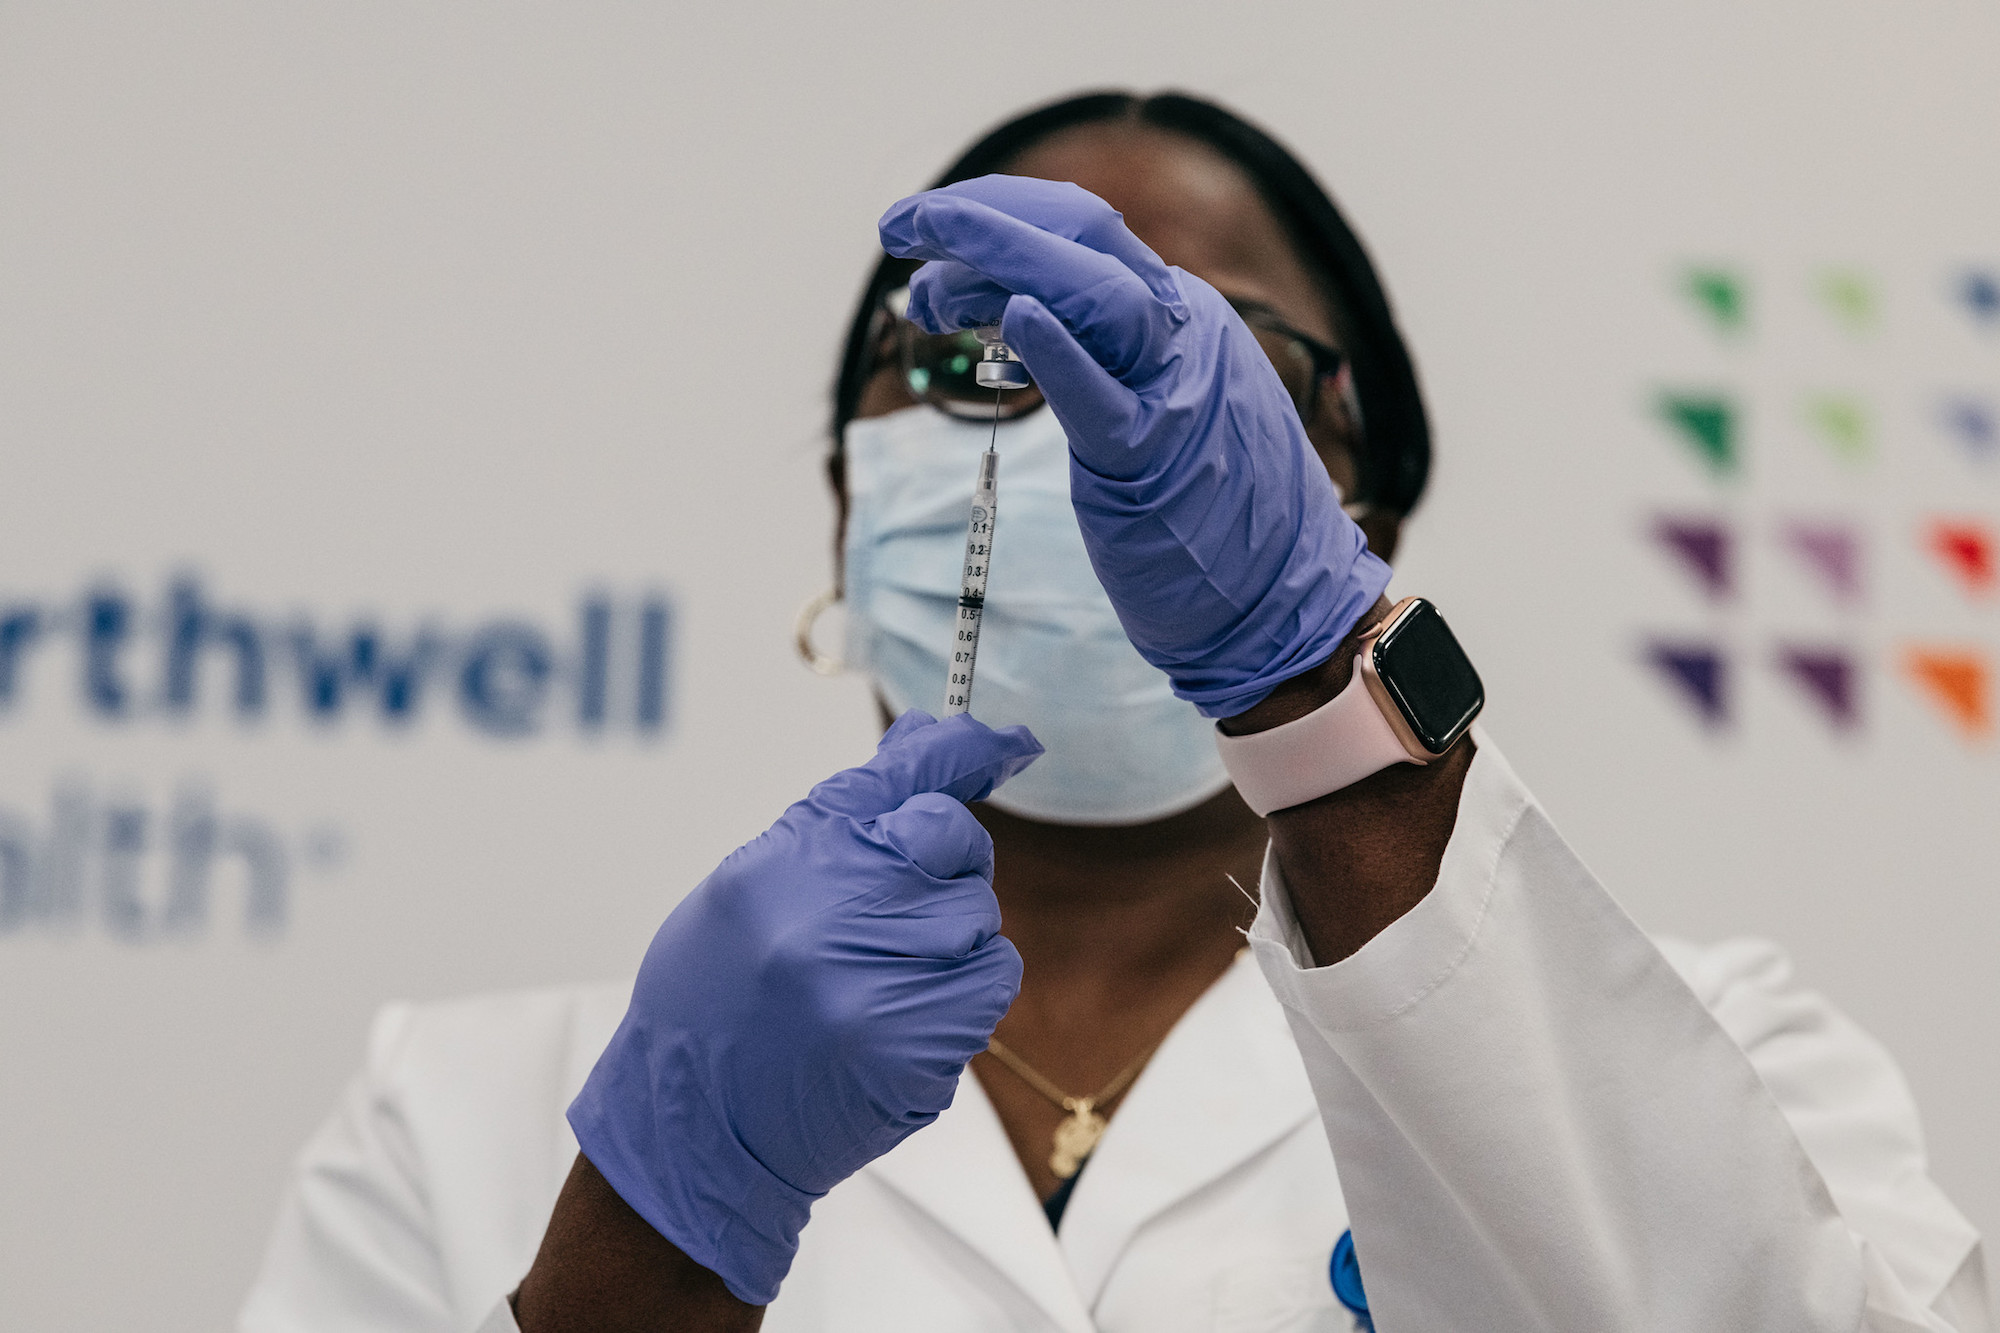 NY healthcare provider suspected of illegally acquiring, dispensing COVID-19 vaccine